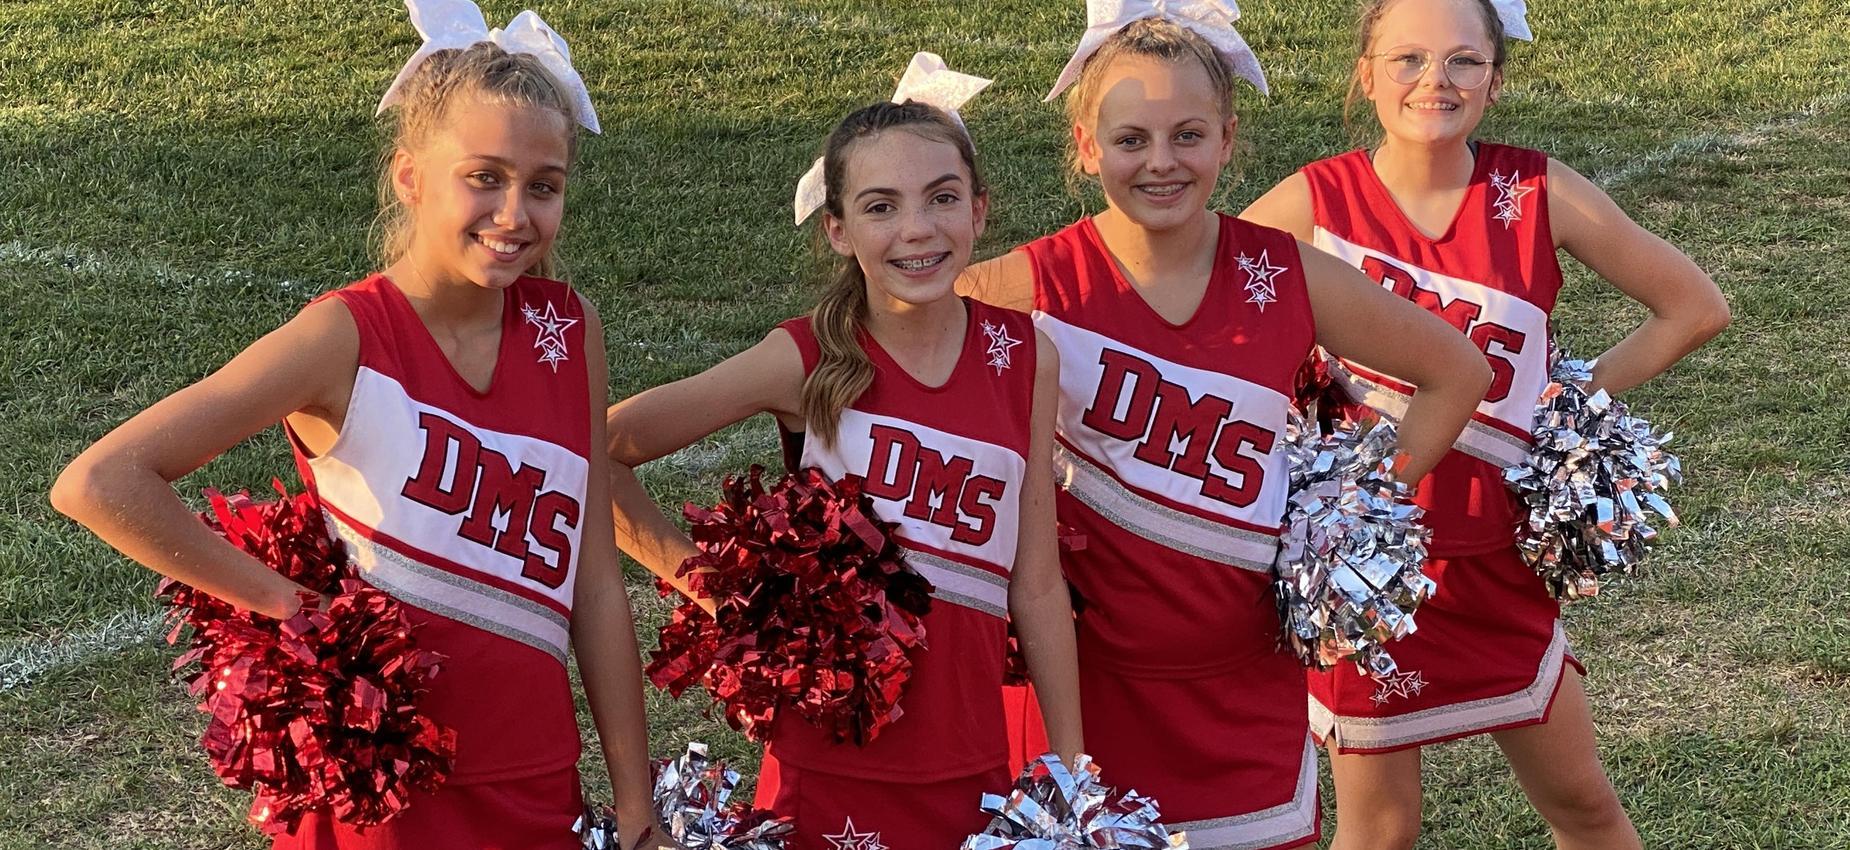 Four cheerleaders pose on a football field.